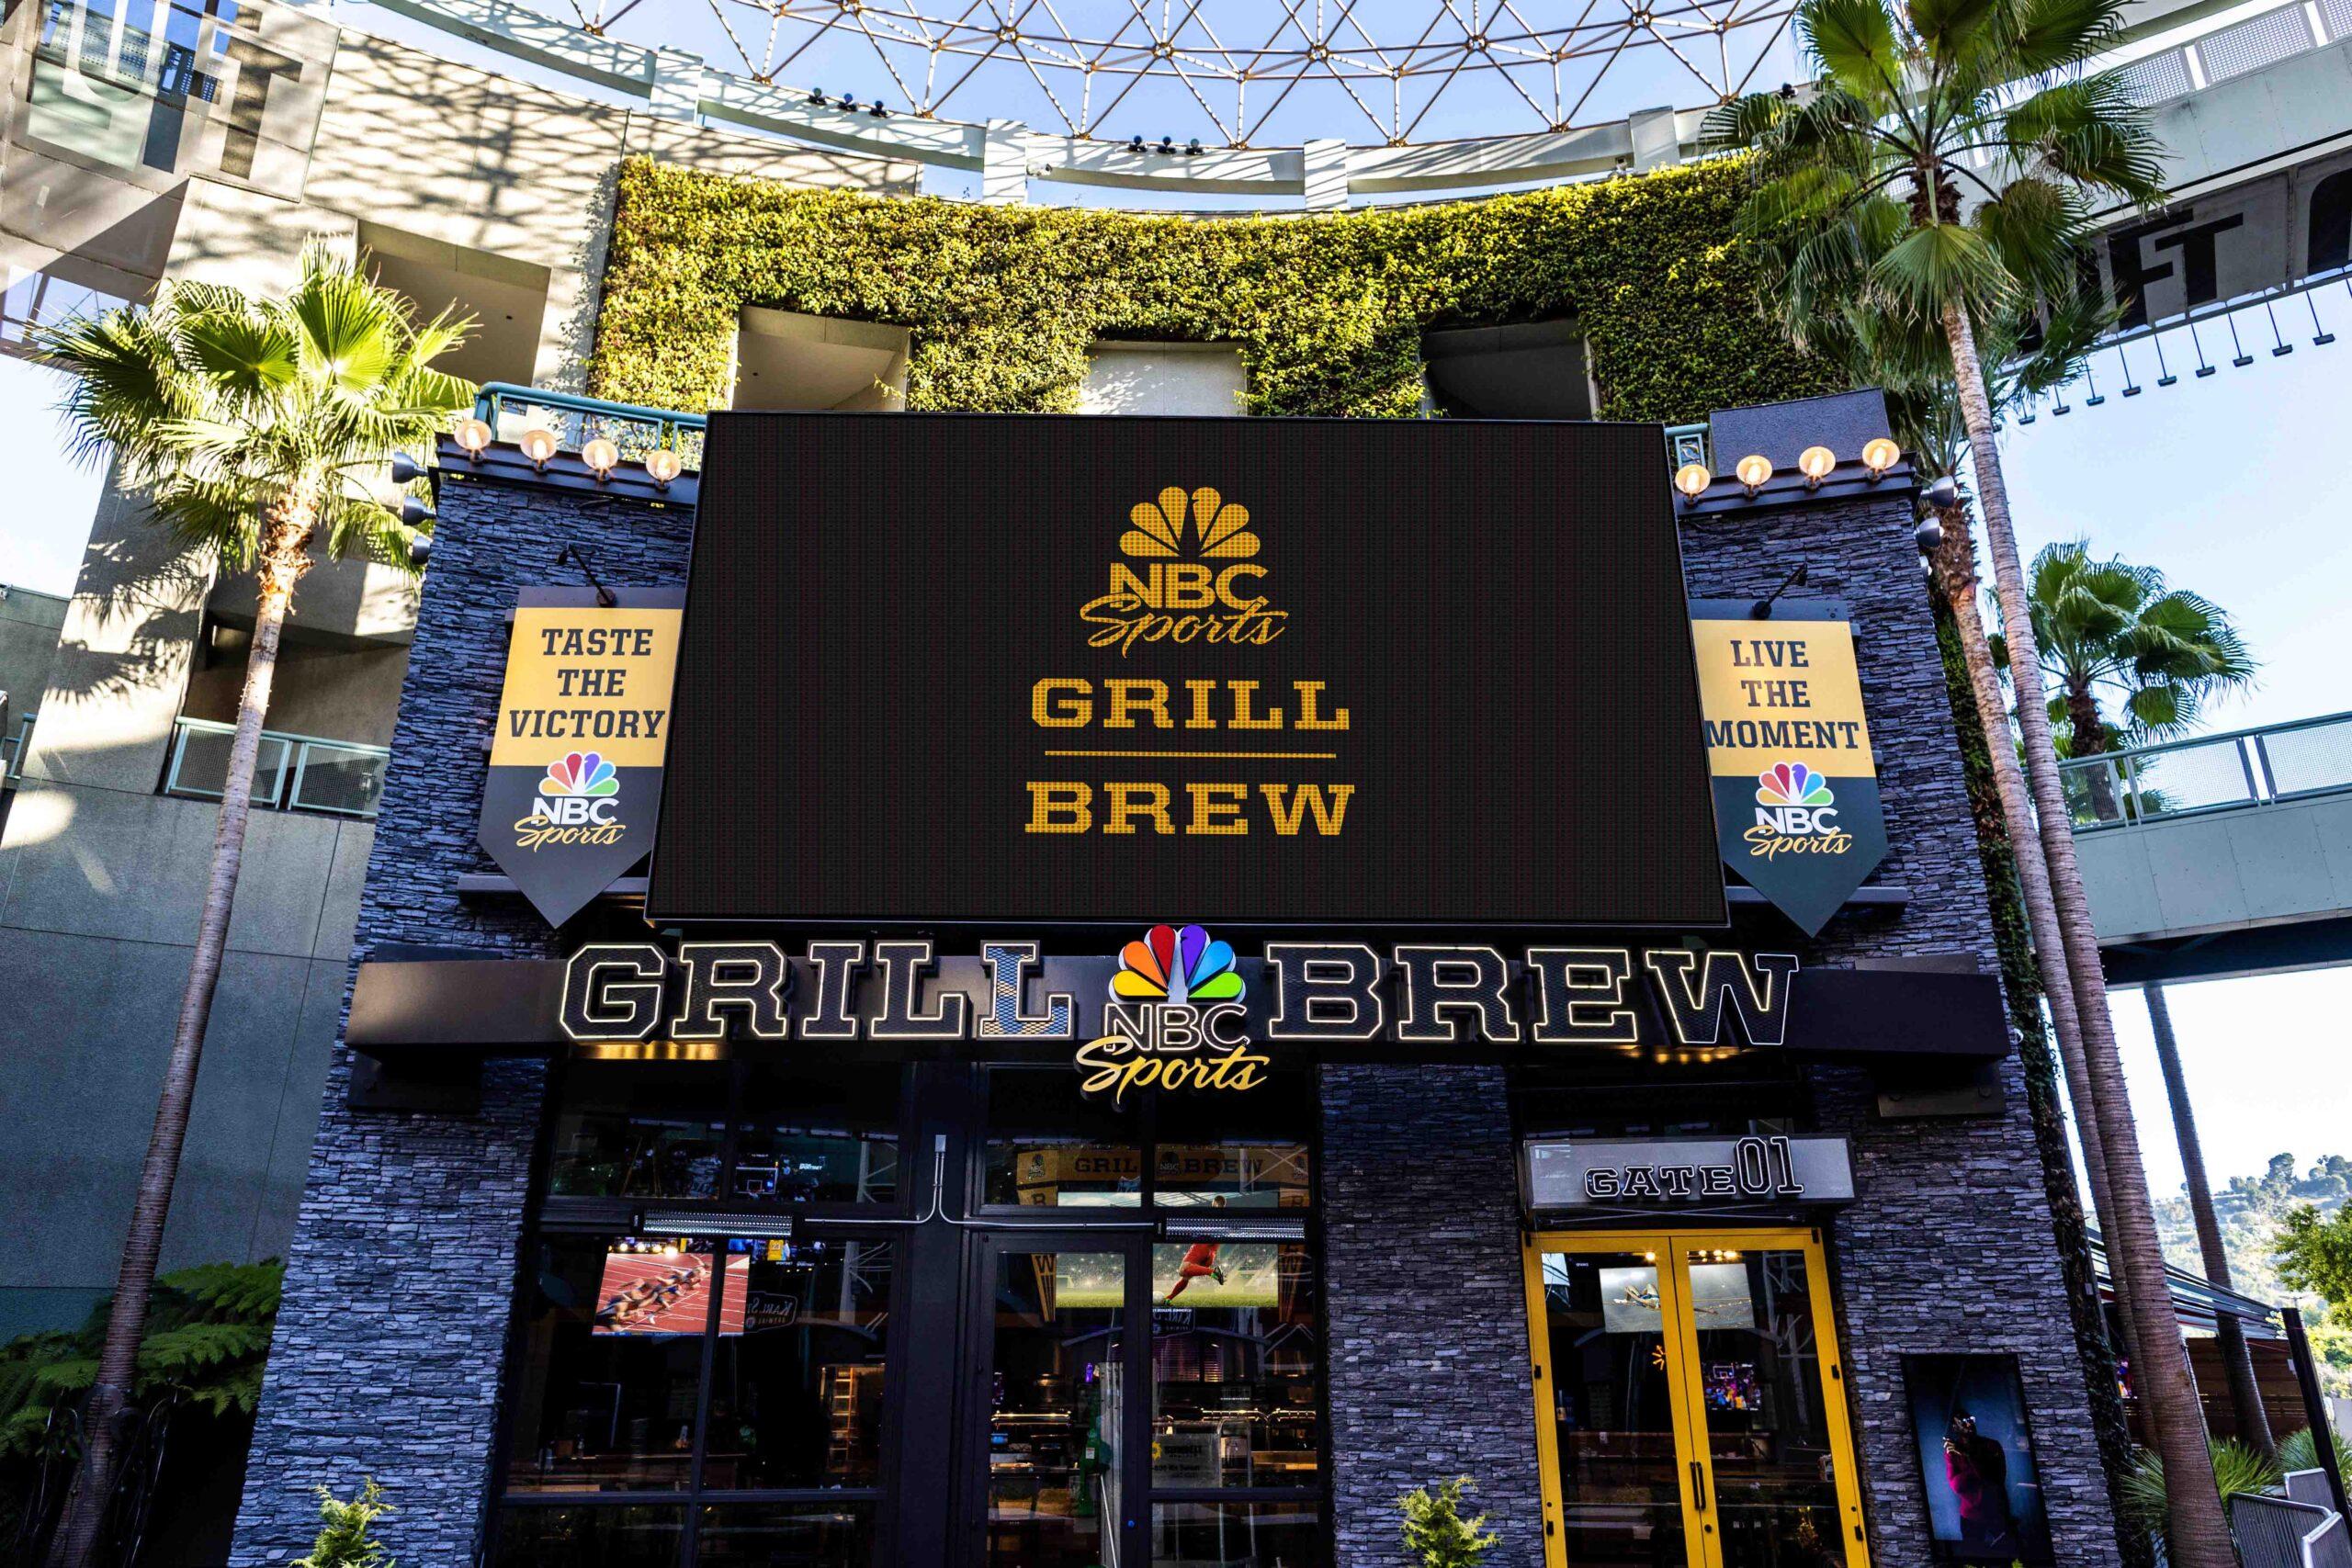 NBC體育啤酒烤肉餐饮店在好萊塢環球影城城市廣場開業